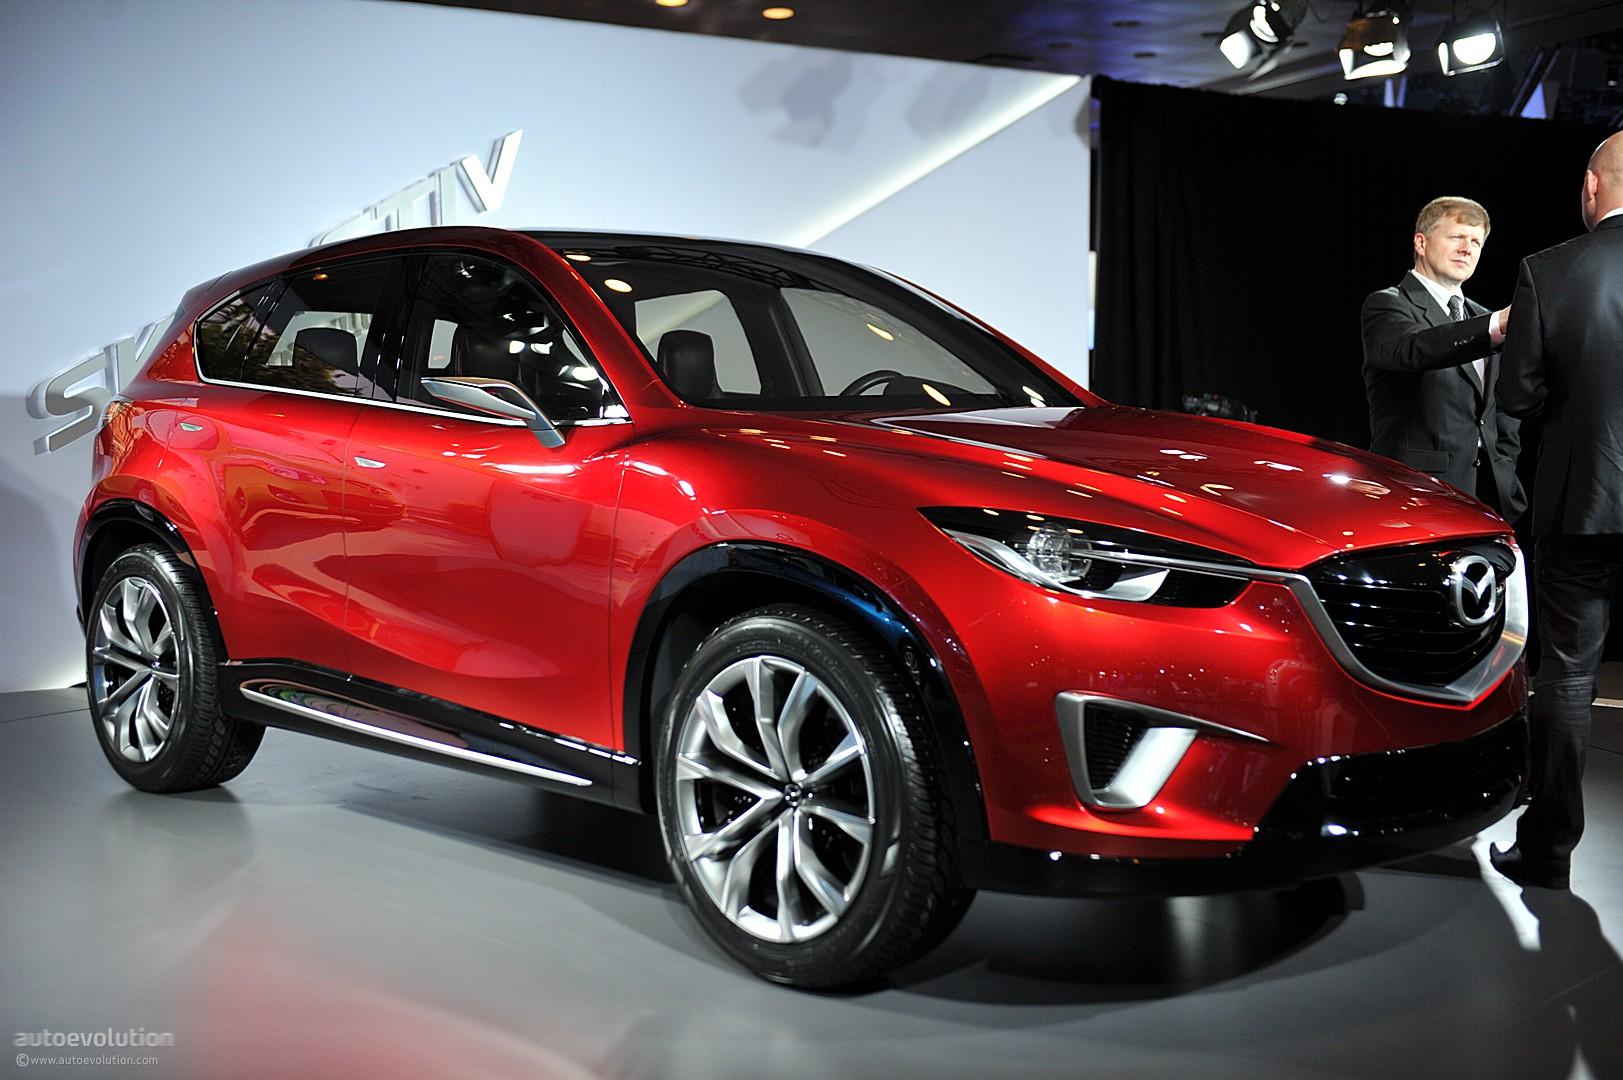 Nyias 2011 Mazda Minagi Concept Live Photos Autoevolution